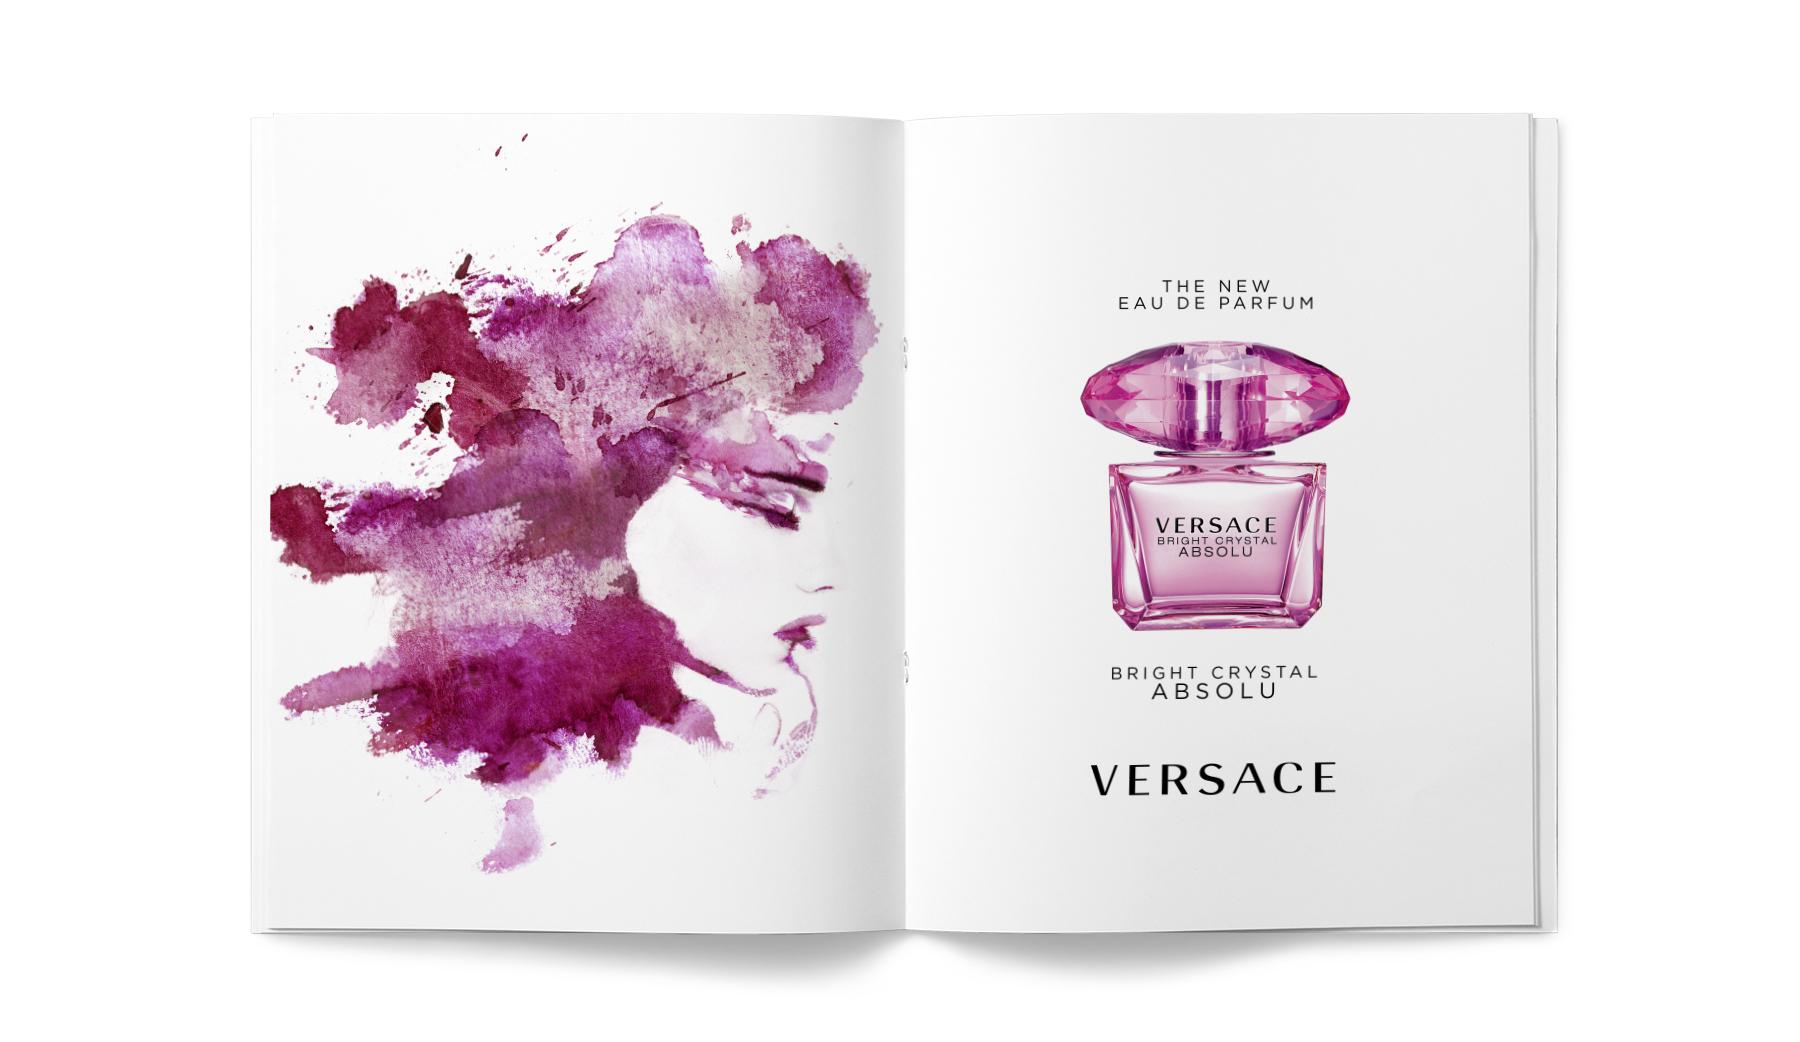 Versace_MagazineSpread.jpg